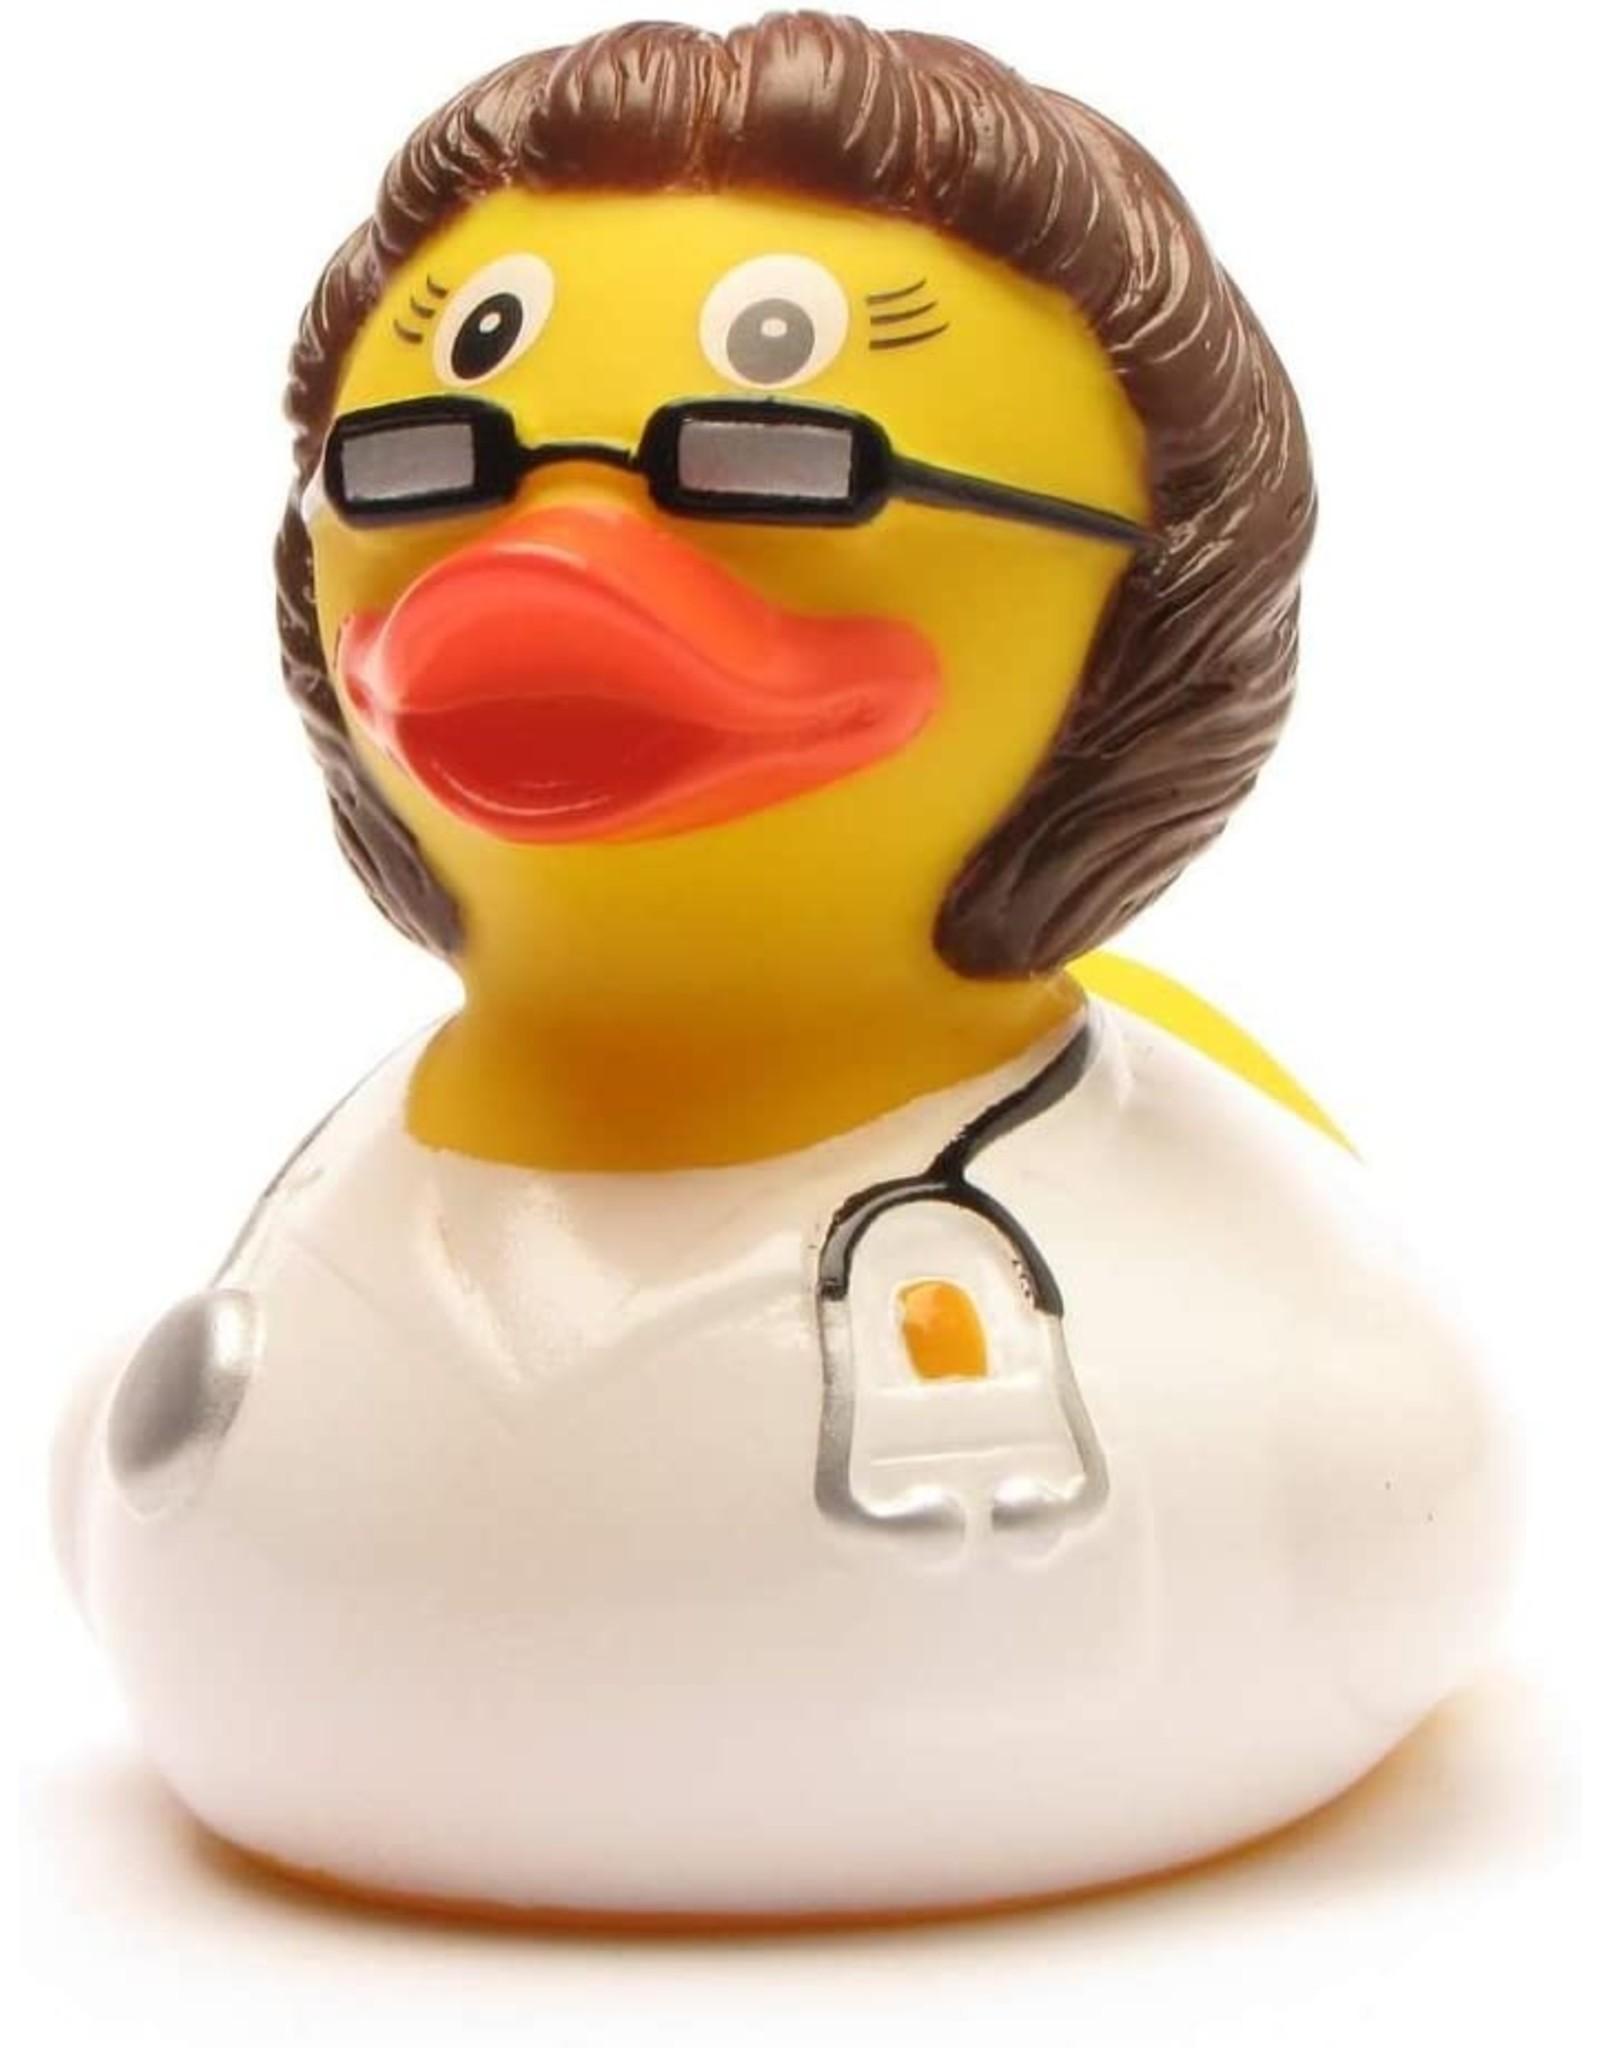 Brunette Doctor Rubber Duck